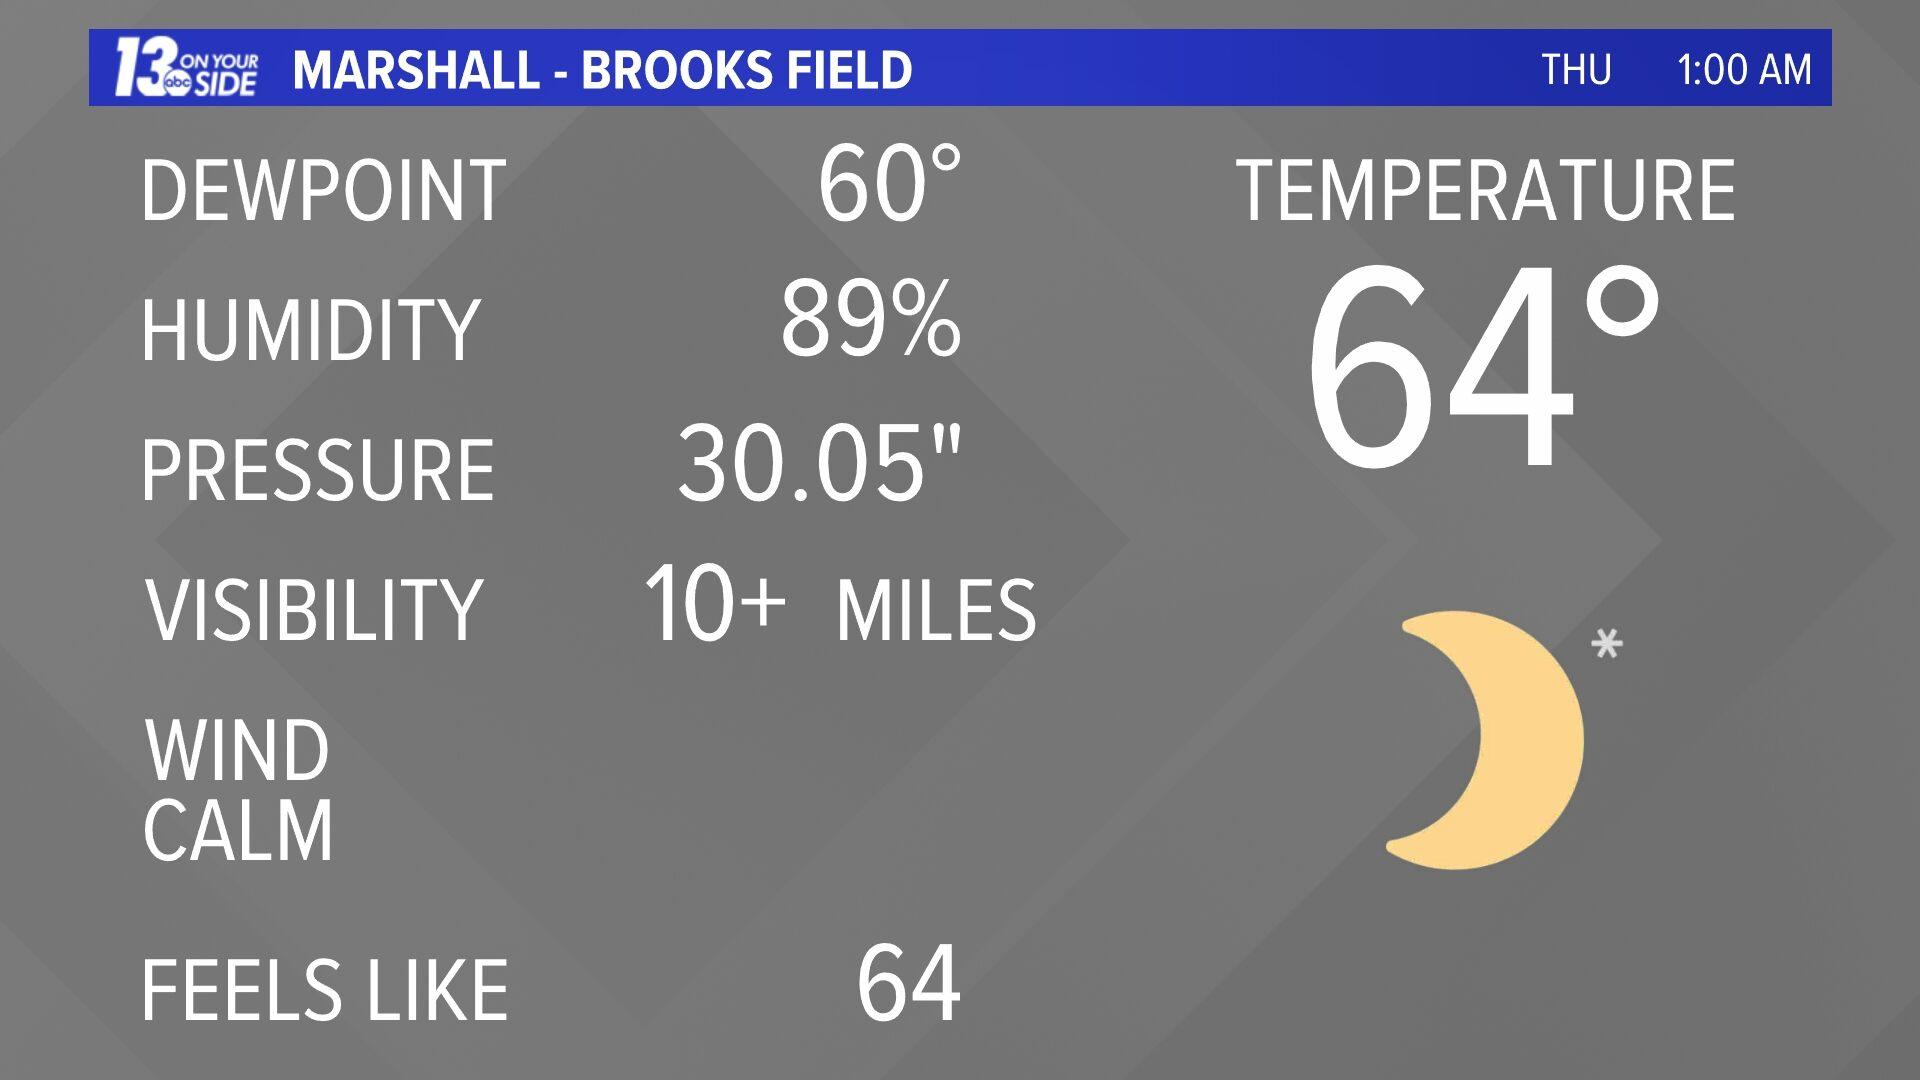 Marshall Airport - Brooks Field